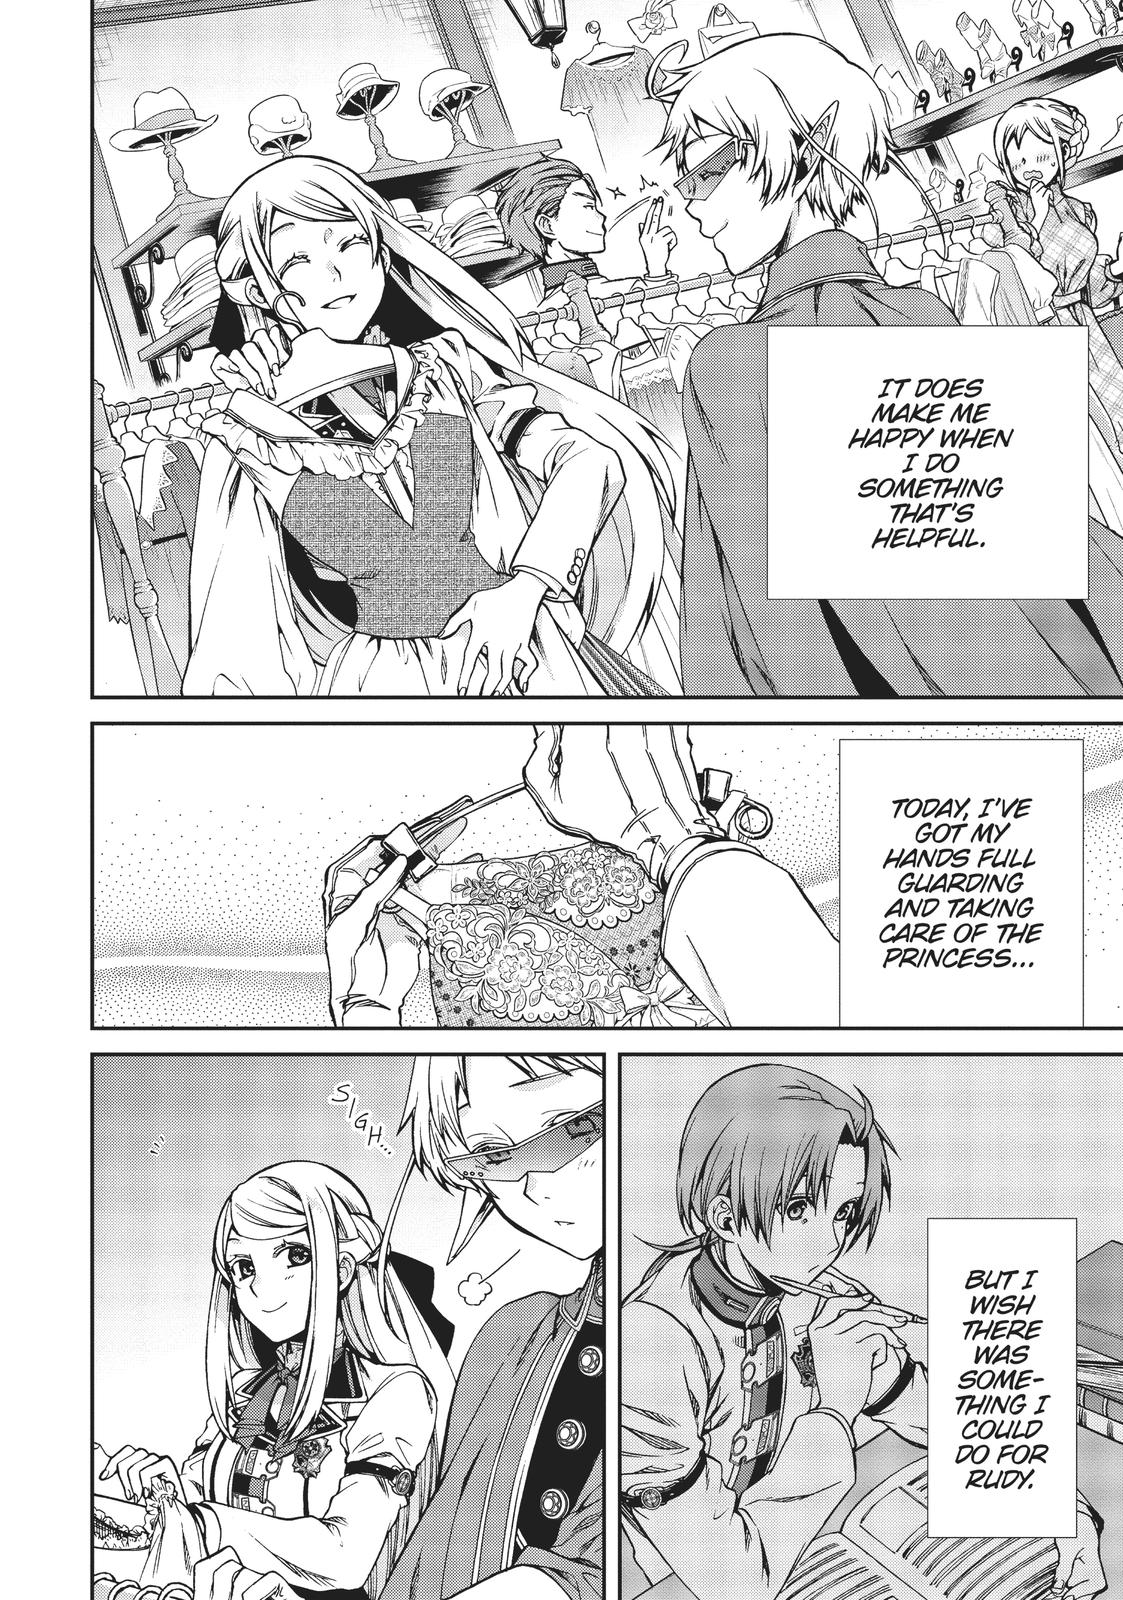 Mushoku Tensei, Chapter 57 image 018